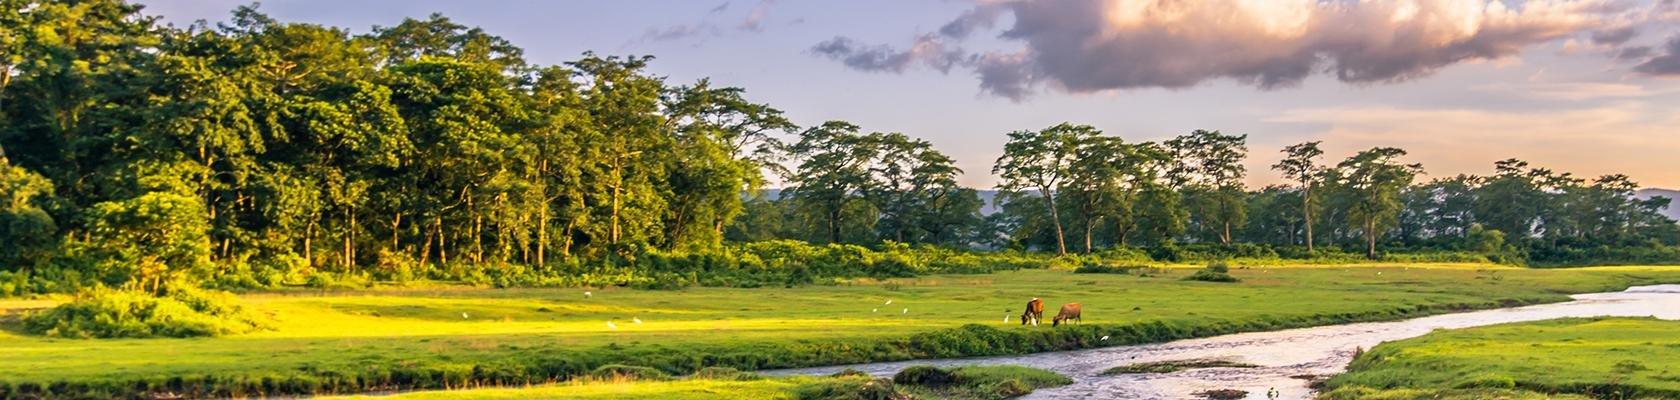 Chitwan Nationaal Park (Nepal)